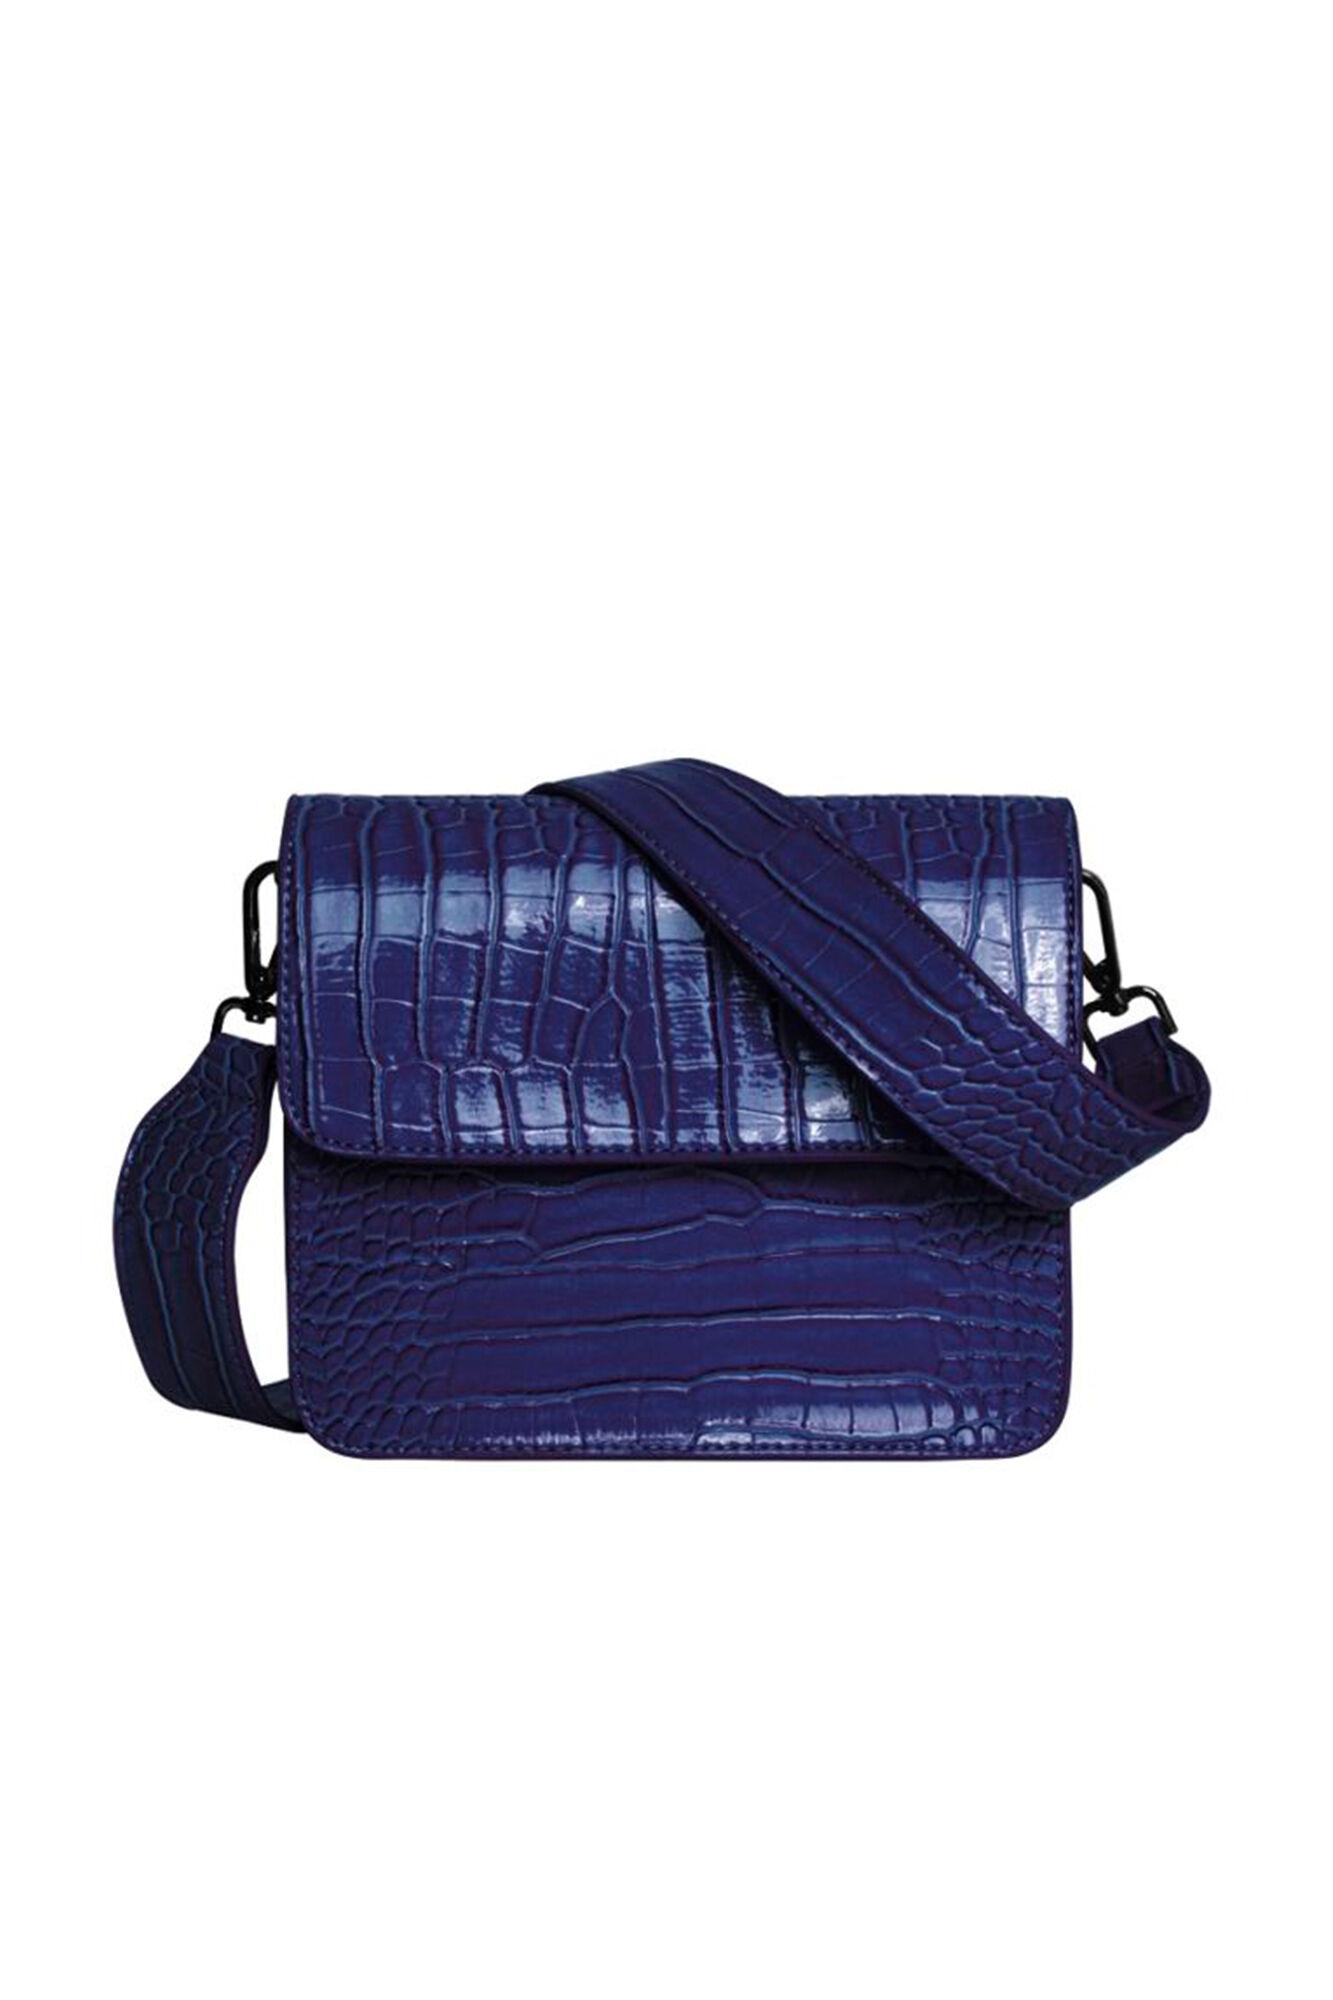 Cayman Shiny Strap H1021, MIDNIGHT BLUE